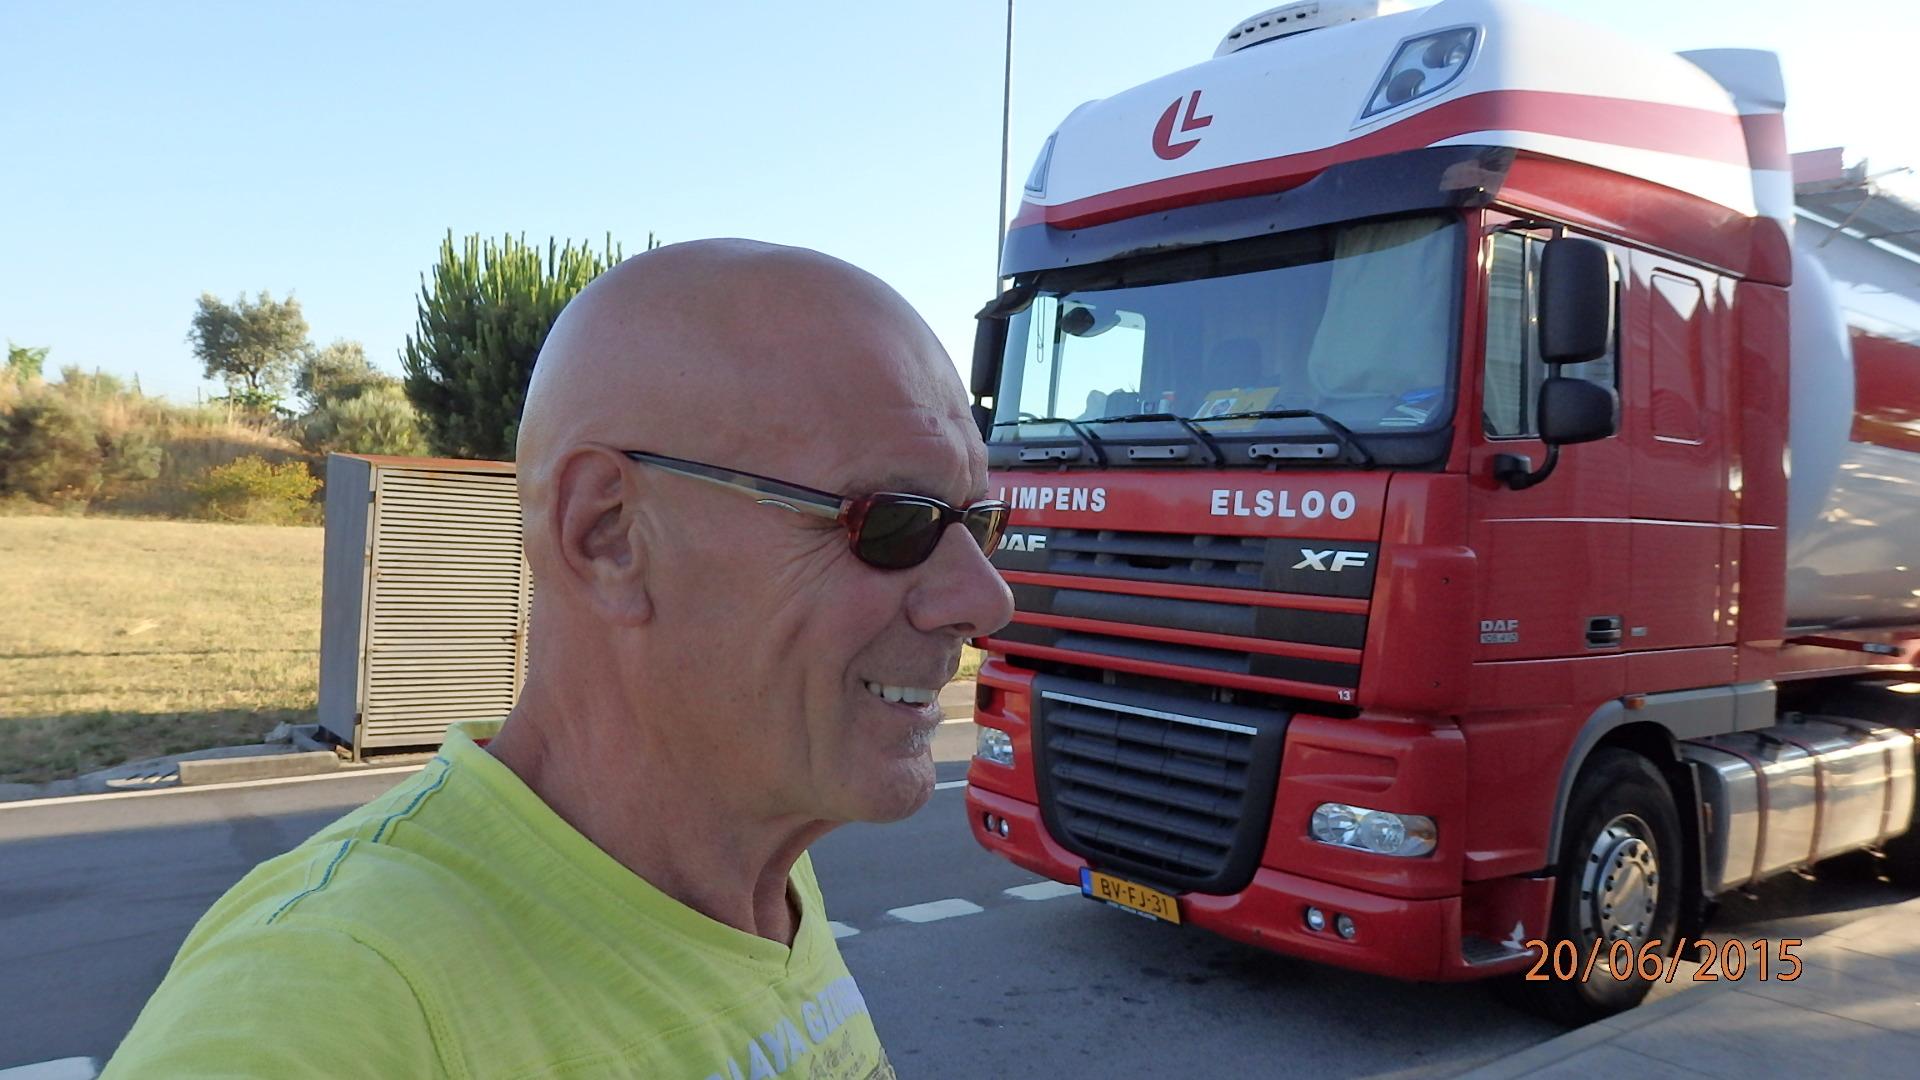 Harald-21